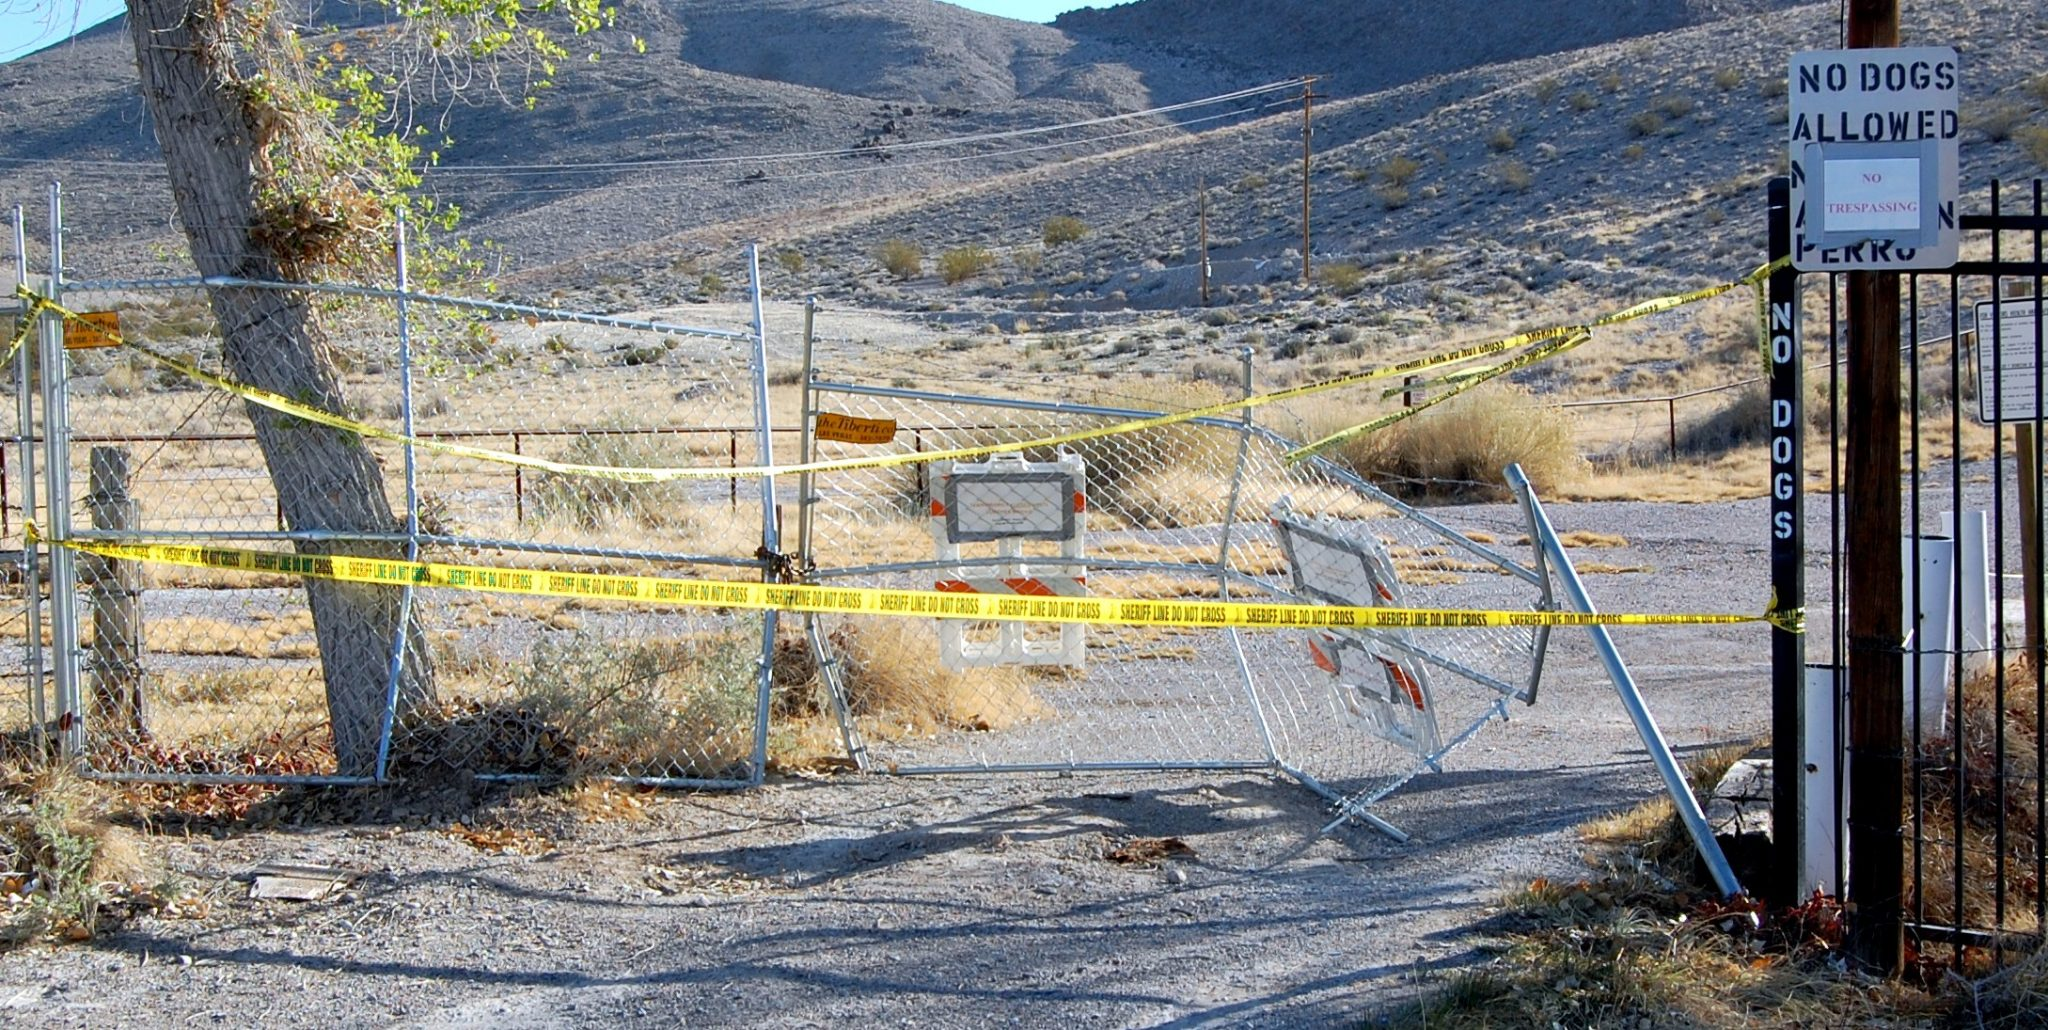 Vandals smash entrance gate of closed Little Ash Springs